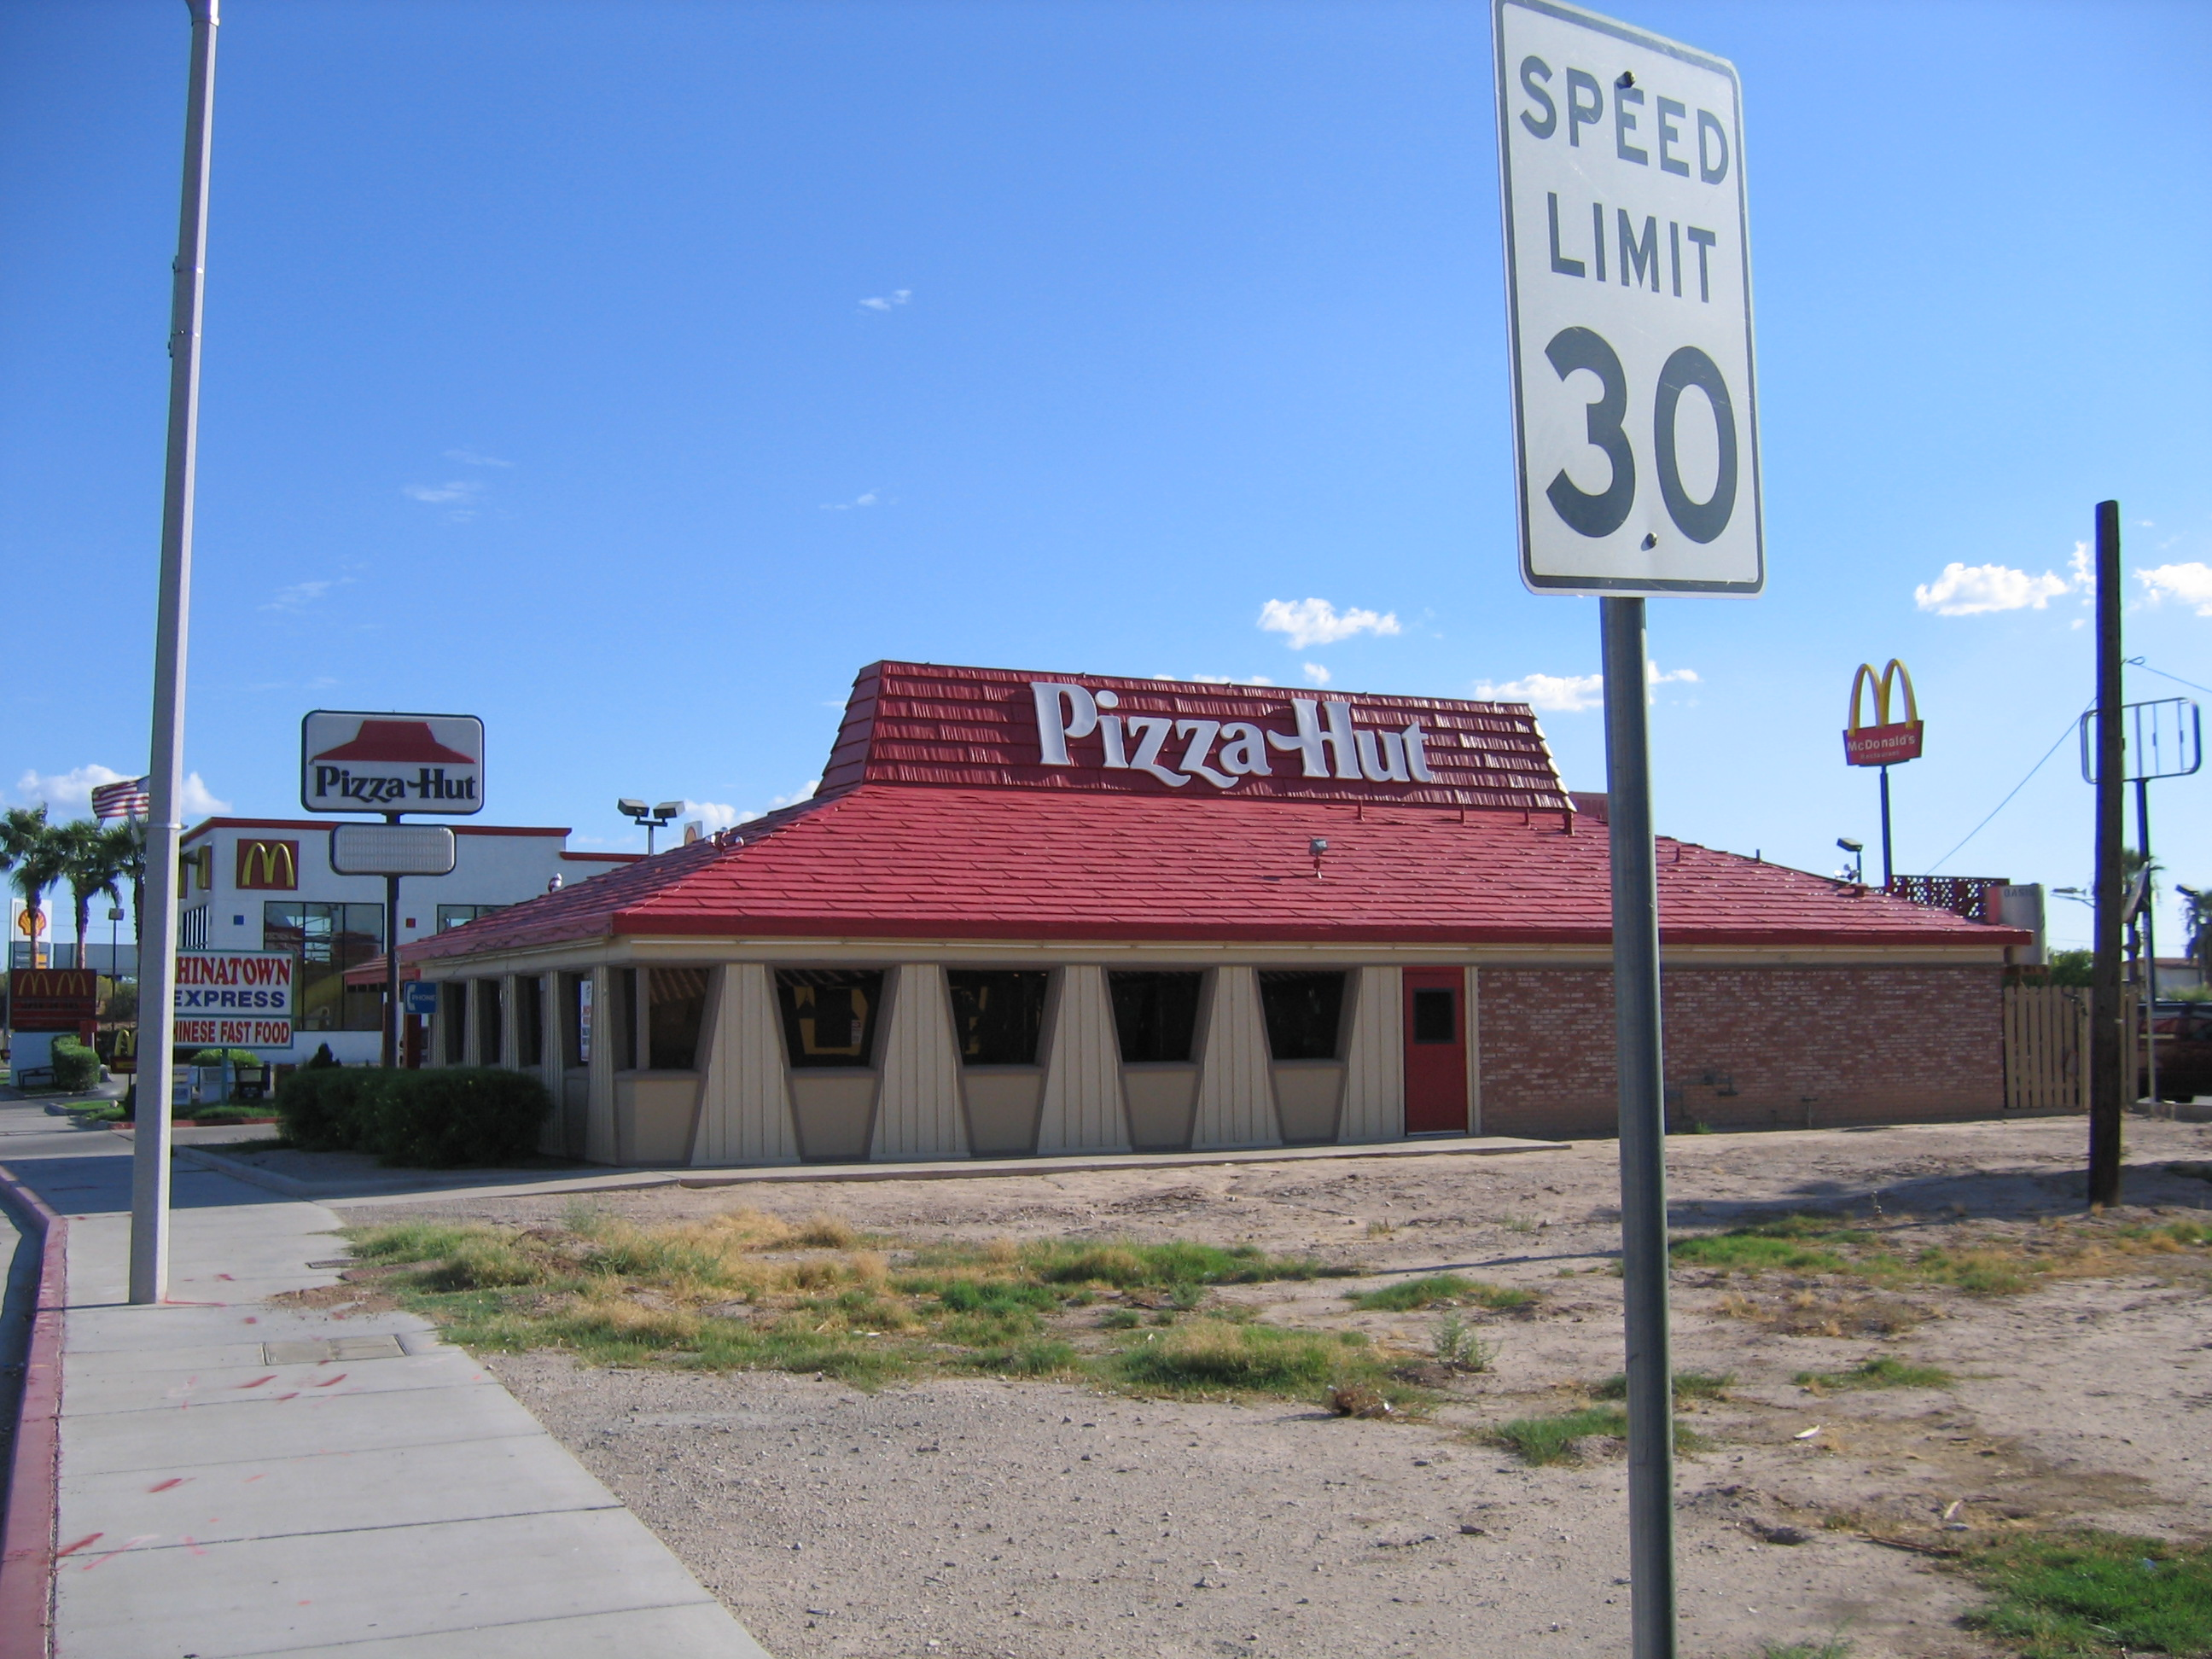 Pizza hut wikipedia autos post - Restaurante pizza hut ...